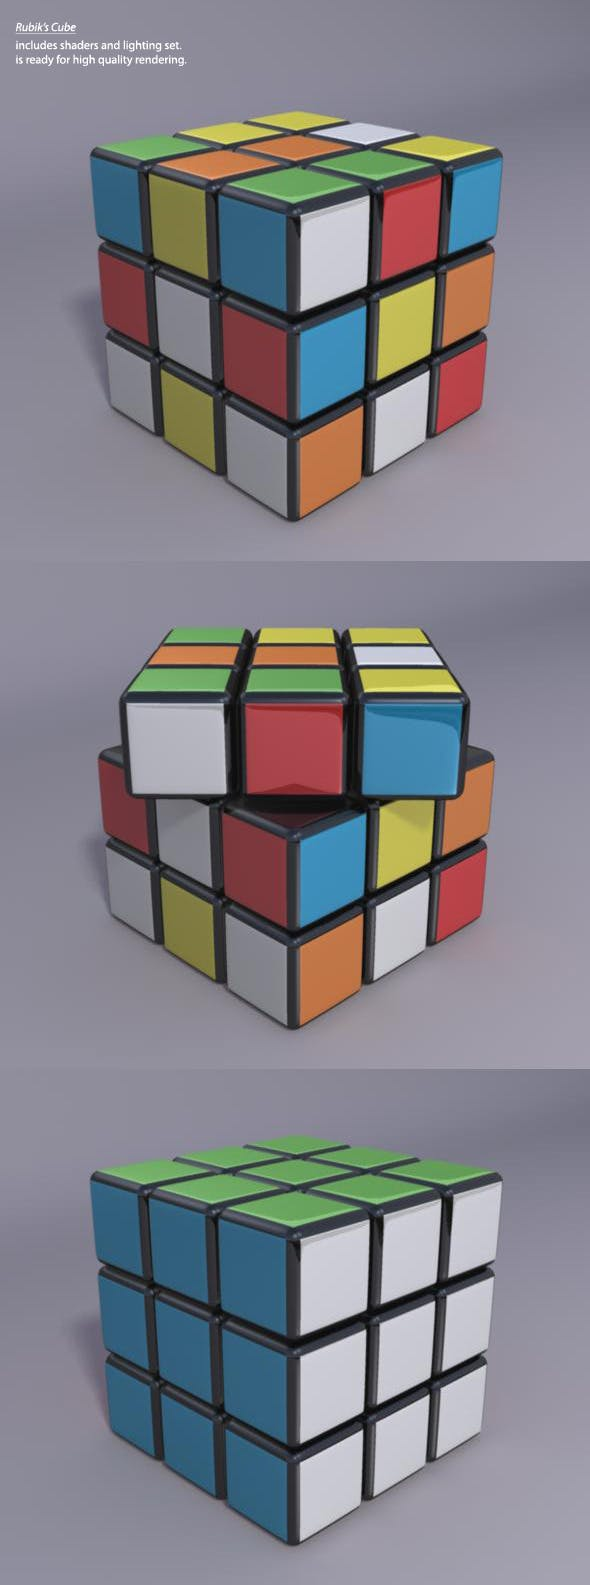 3D High quality Rubik's Cube - 3DOcean Item for Sale